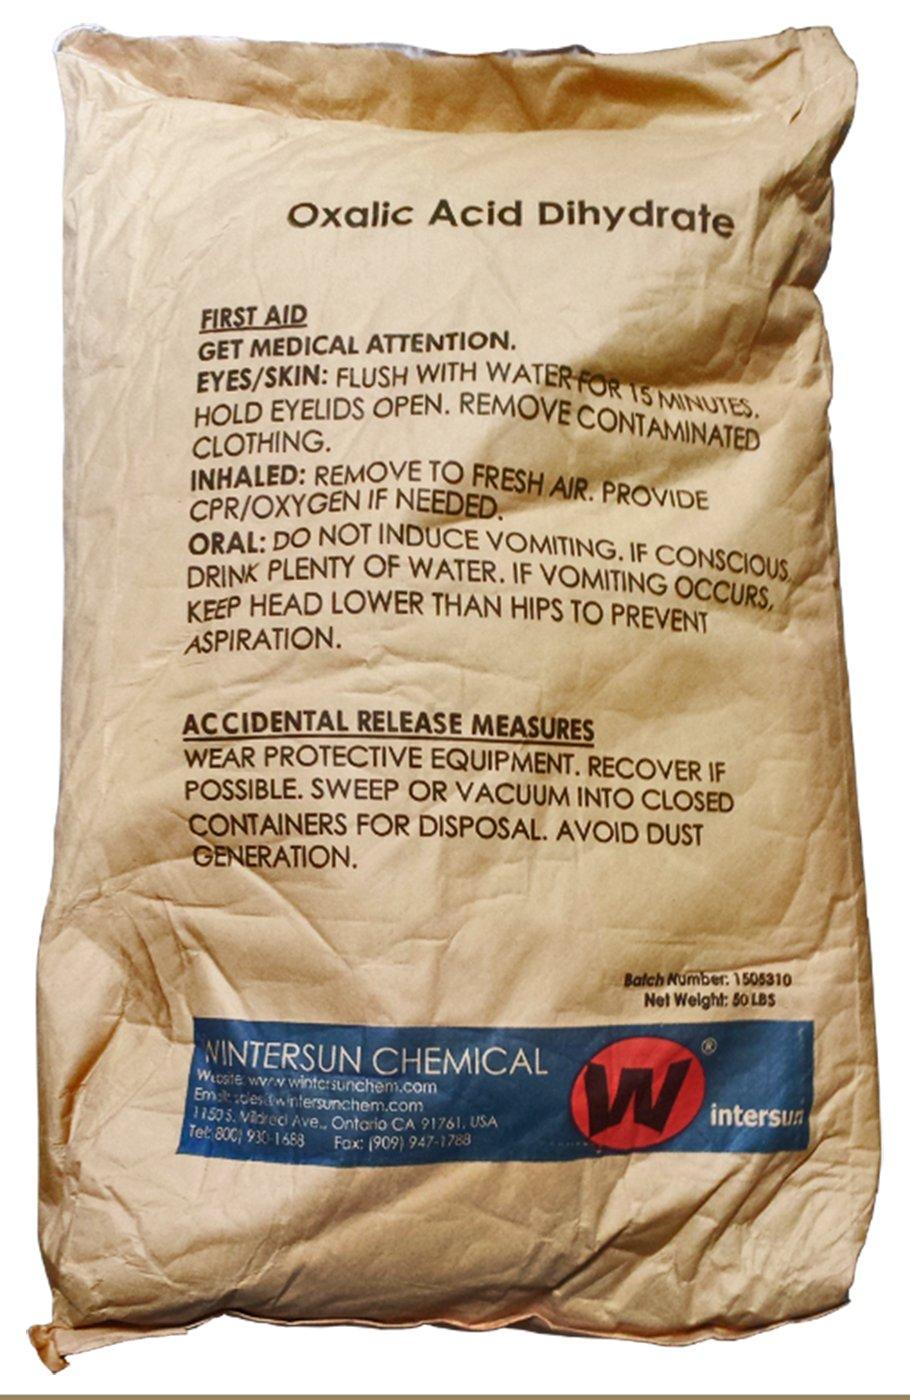 Oxalic Acid Dihydrate [H2C2O4 2H2O ] [CAS_6153-56-6] 99.6+% Fine White Crystal/ Powder (50 Lbs Bag) by Wintersun Chemical